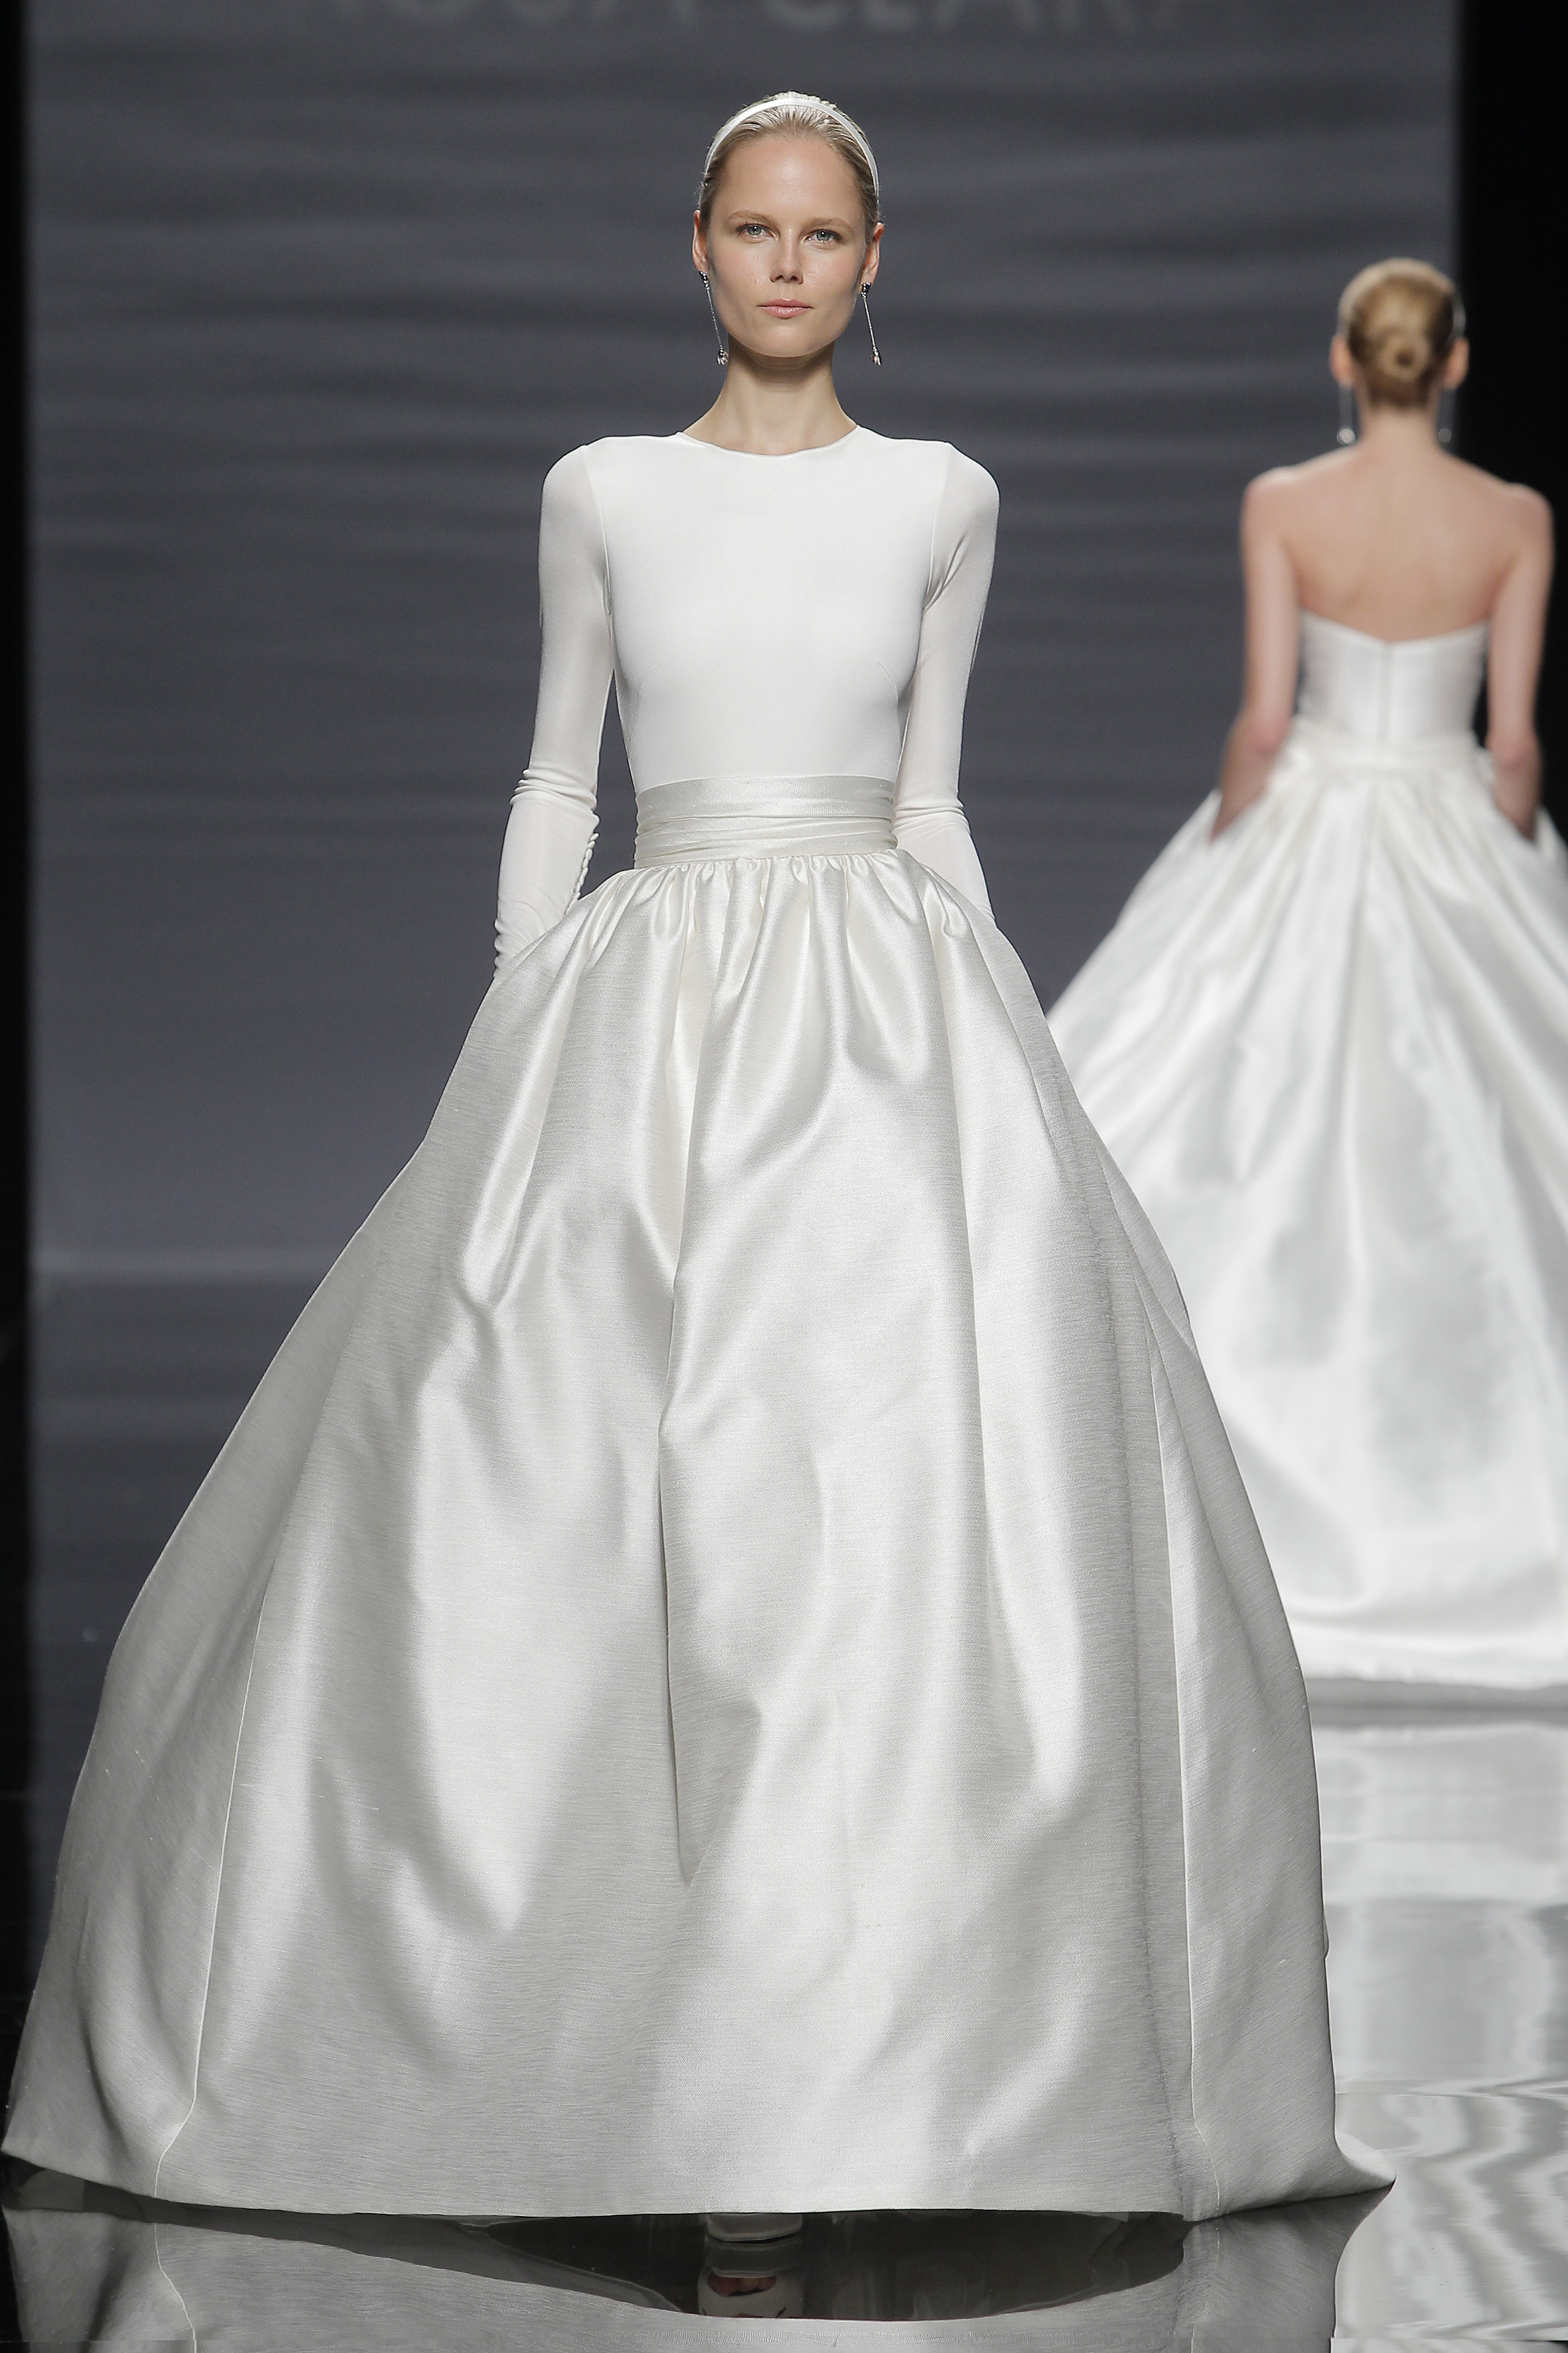 Rosa clara wedding dress 2014 bridal 9 for Rosa clara wedding dresses 2014